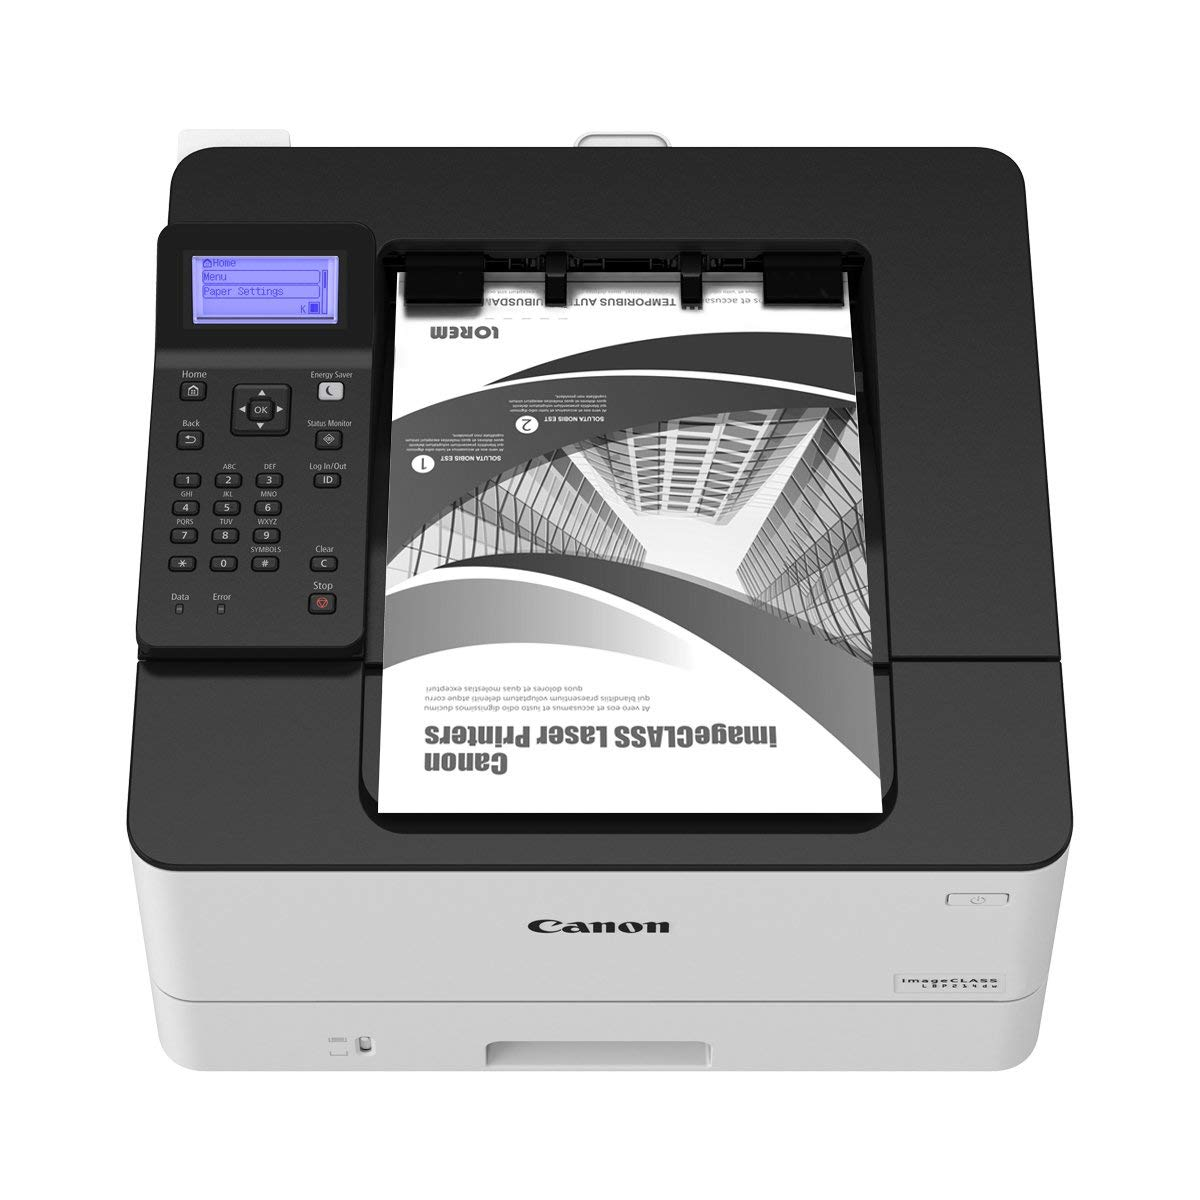 65% OFF – Canon imageClass Wireless Laser Printer